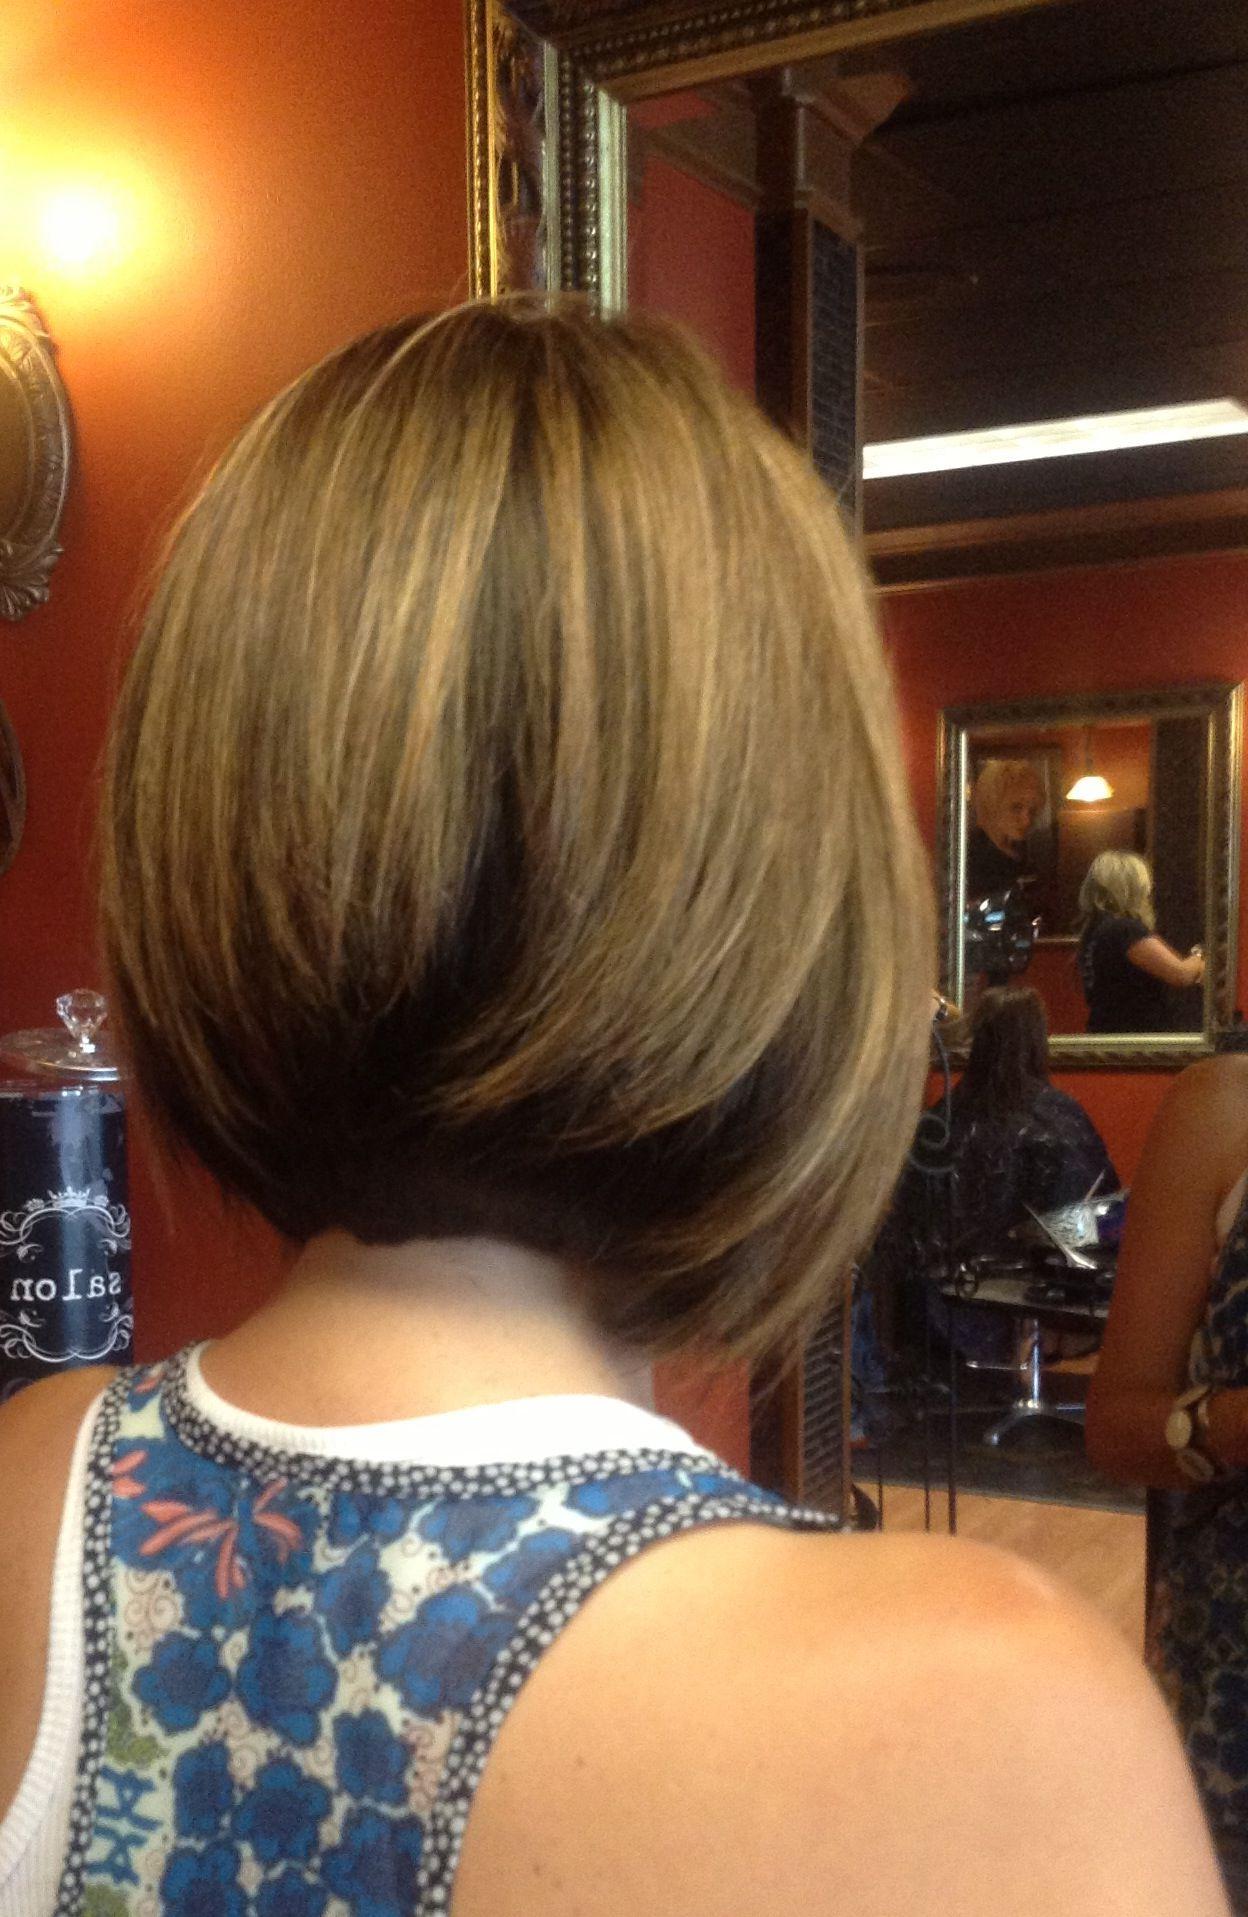 Most Recent Inverted Bob Medium Haircuts Regarding Medium Length Inverted Bob With Long Layers. Razor Cut. (View 3 of 20)